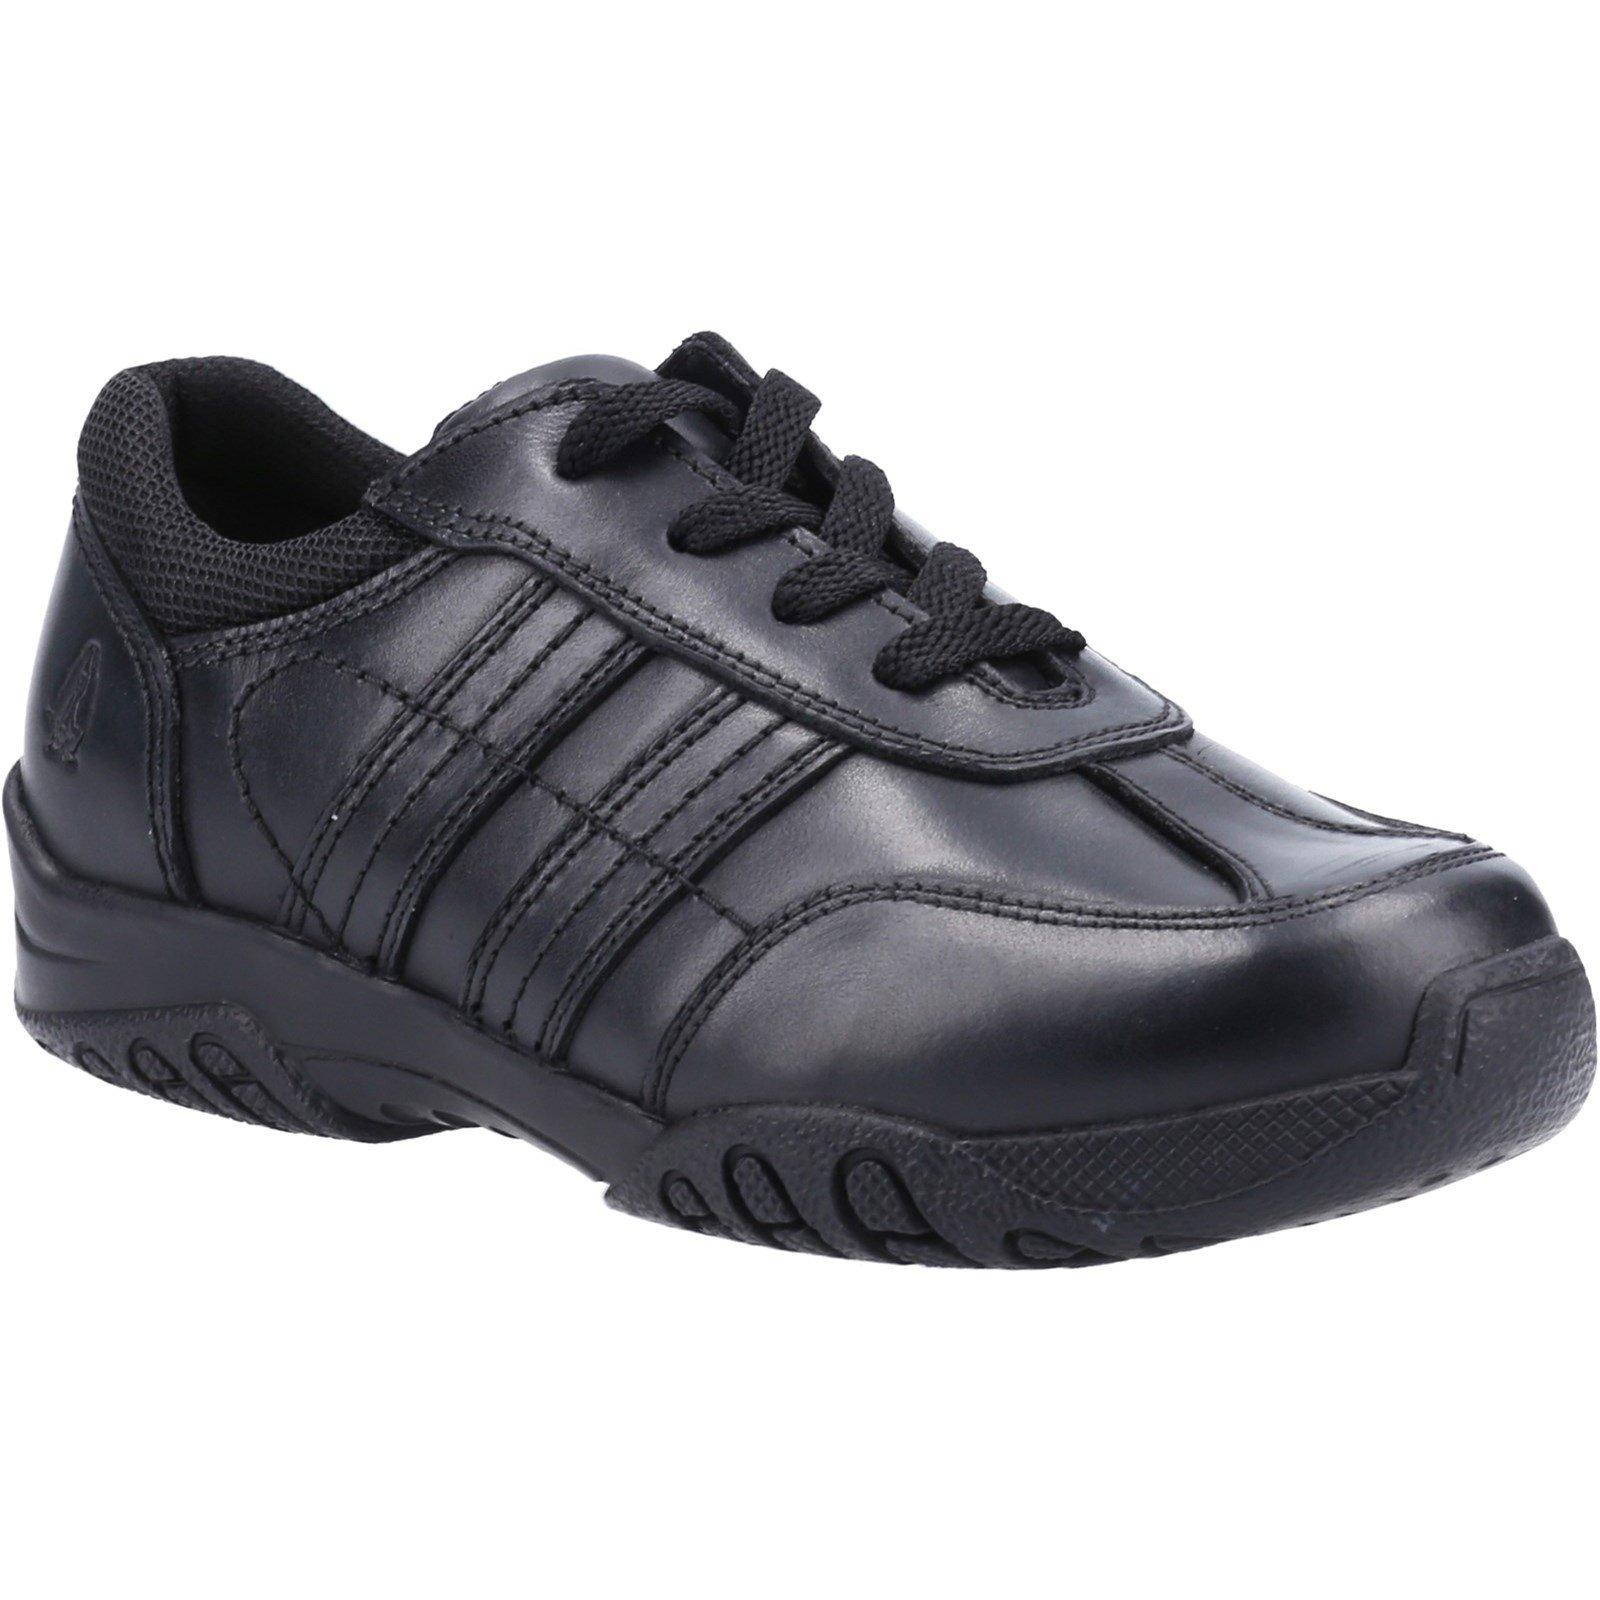 Hush Puppies Kid's Jezza2 Junior School Shoe Black 32606 - Black 2.5